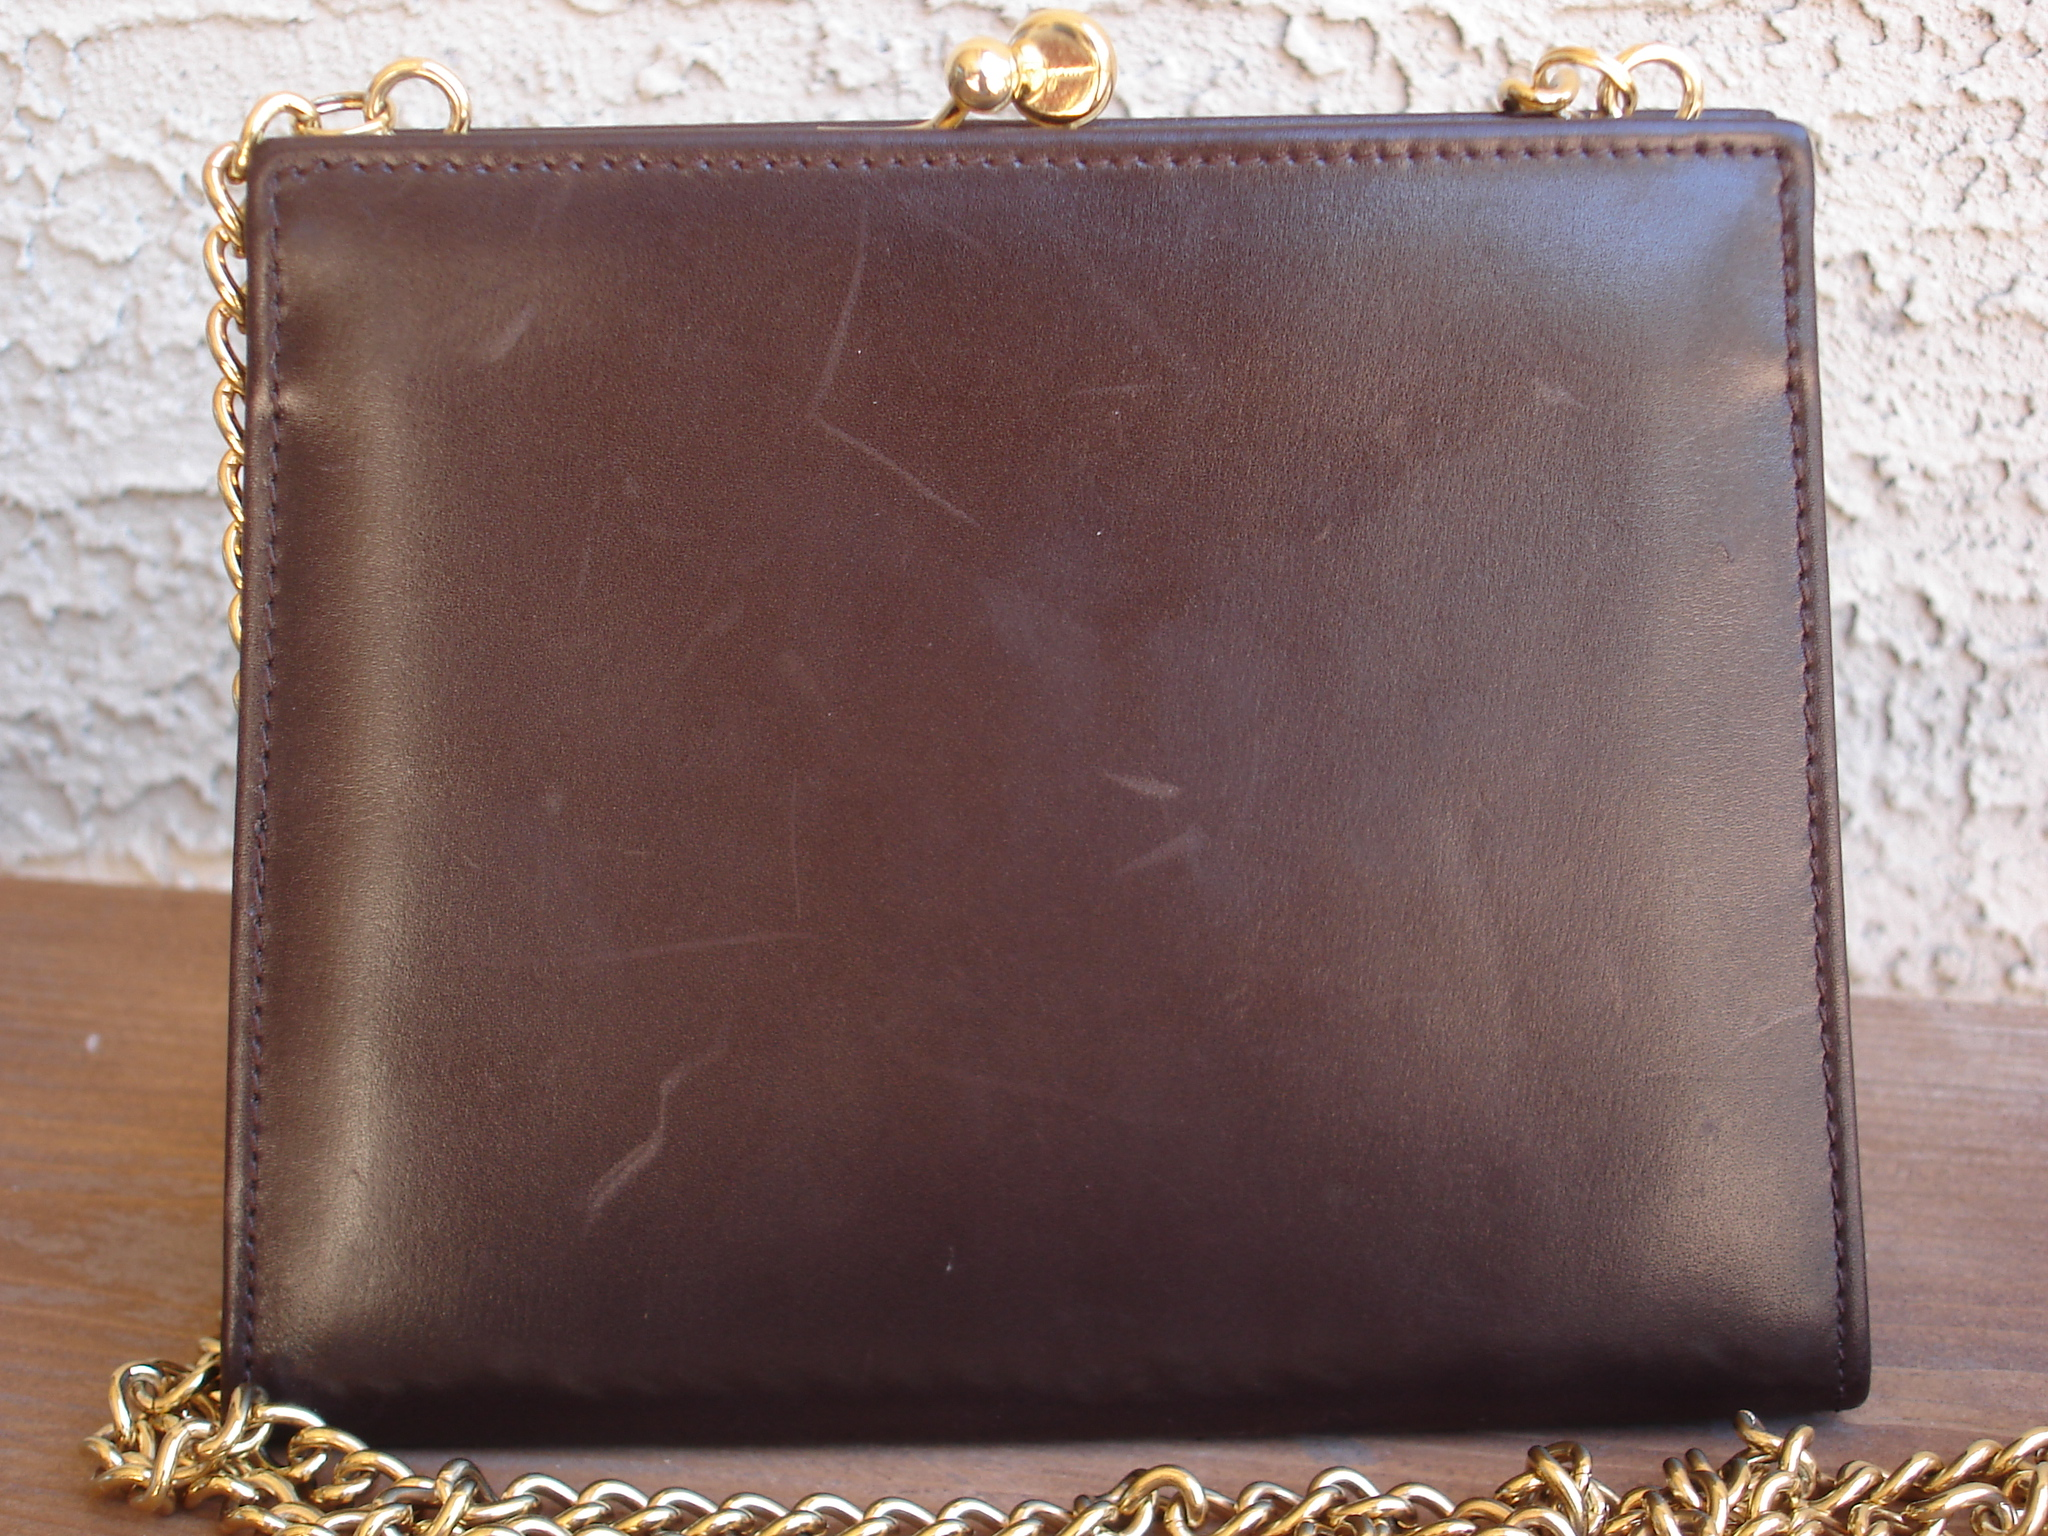 b6314881c ... Authentic Vintage Salvatore Ferragamo Vara Gold Chain Brown Leather  Mini Bag Pouch Purse - Thumbnail 4